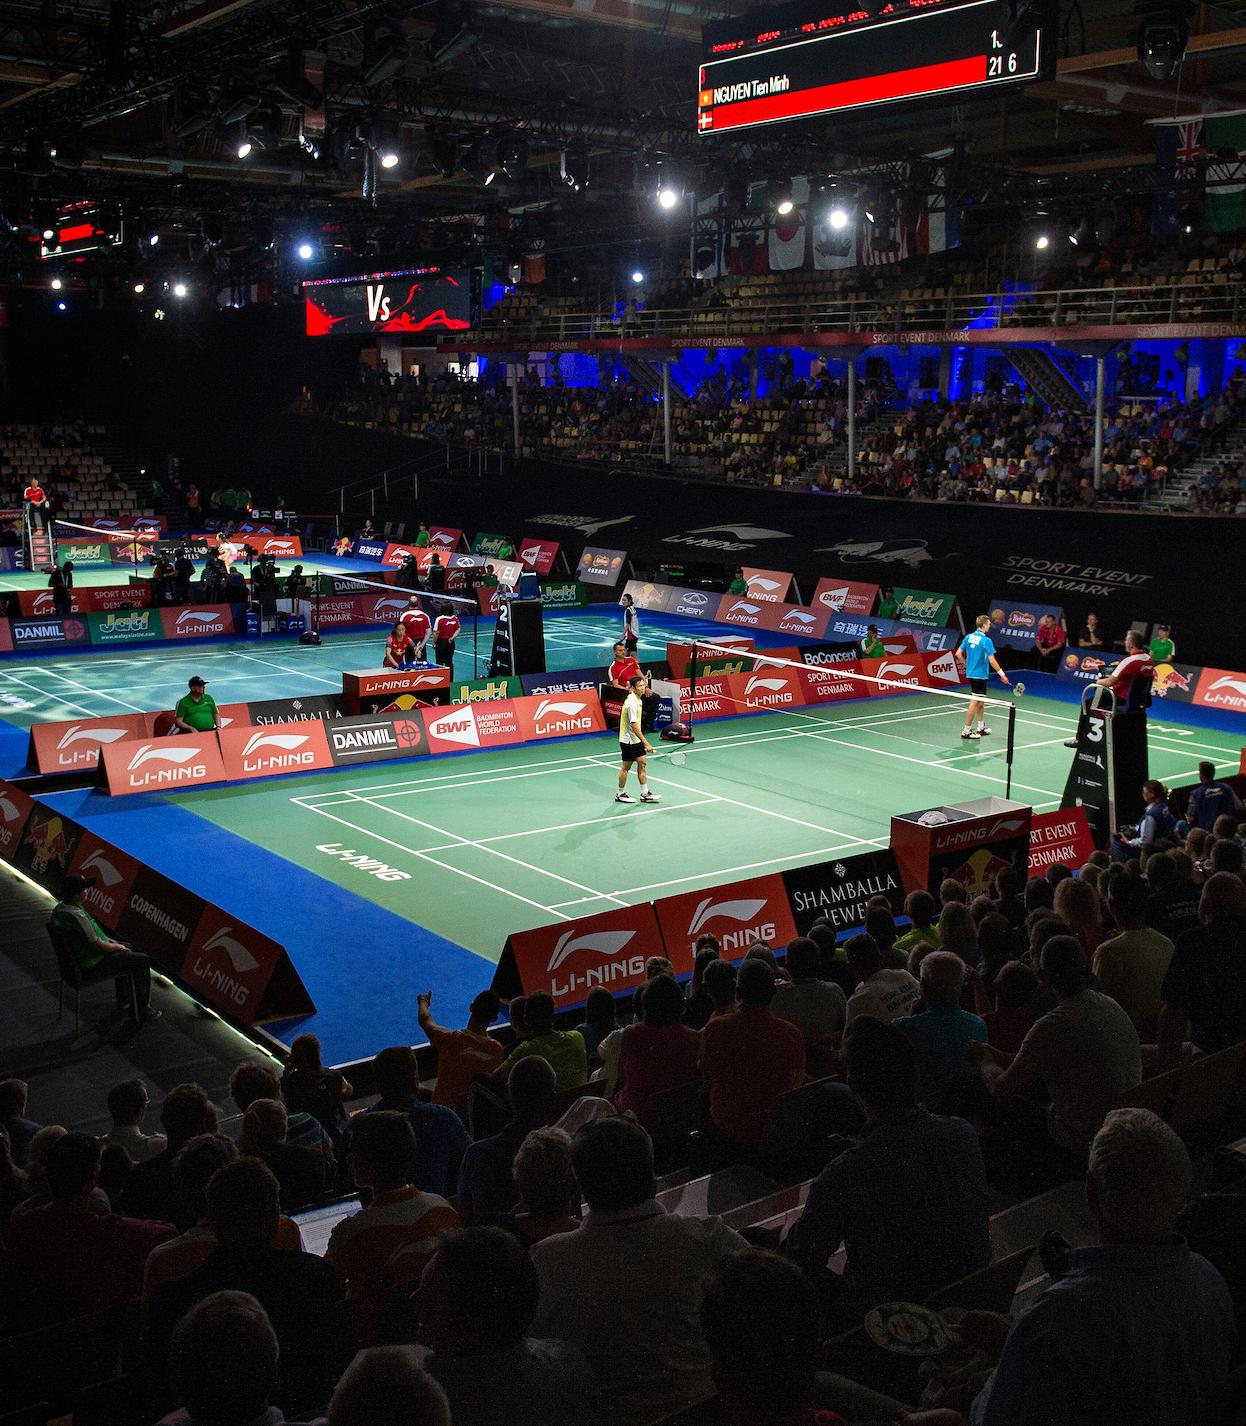 VM badminton 2014